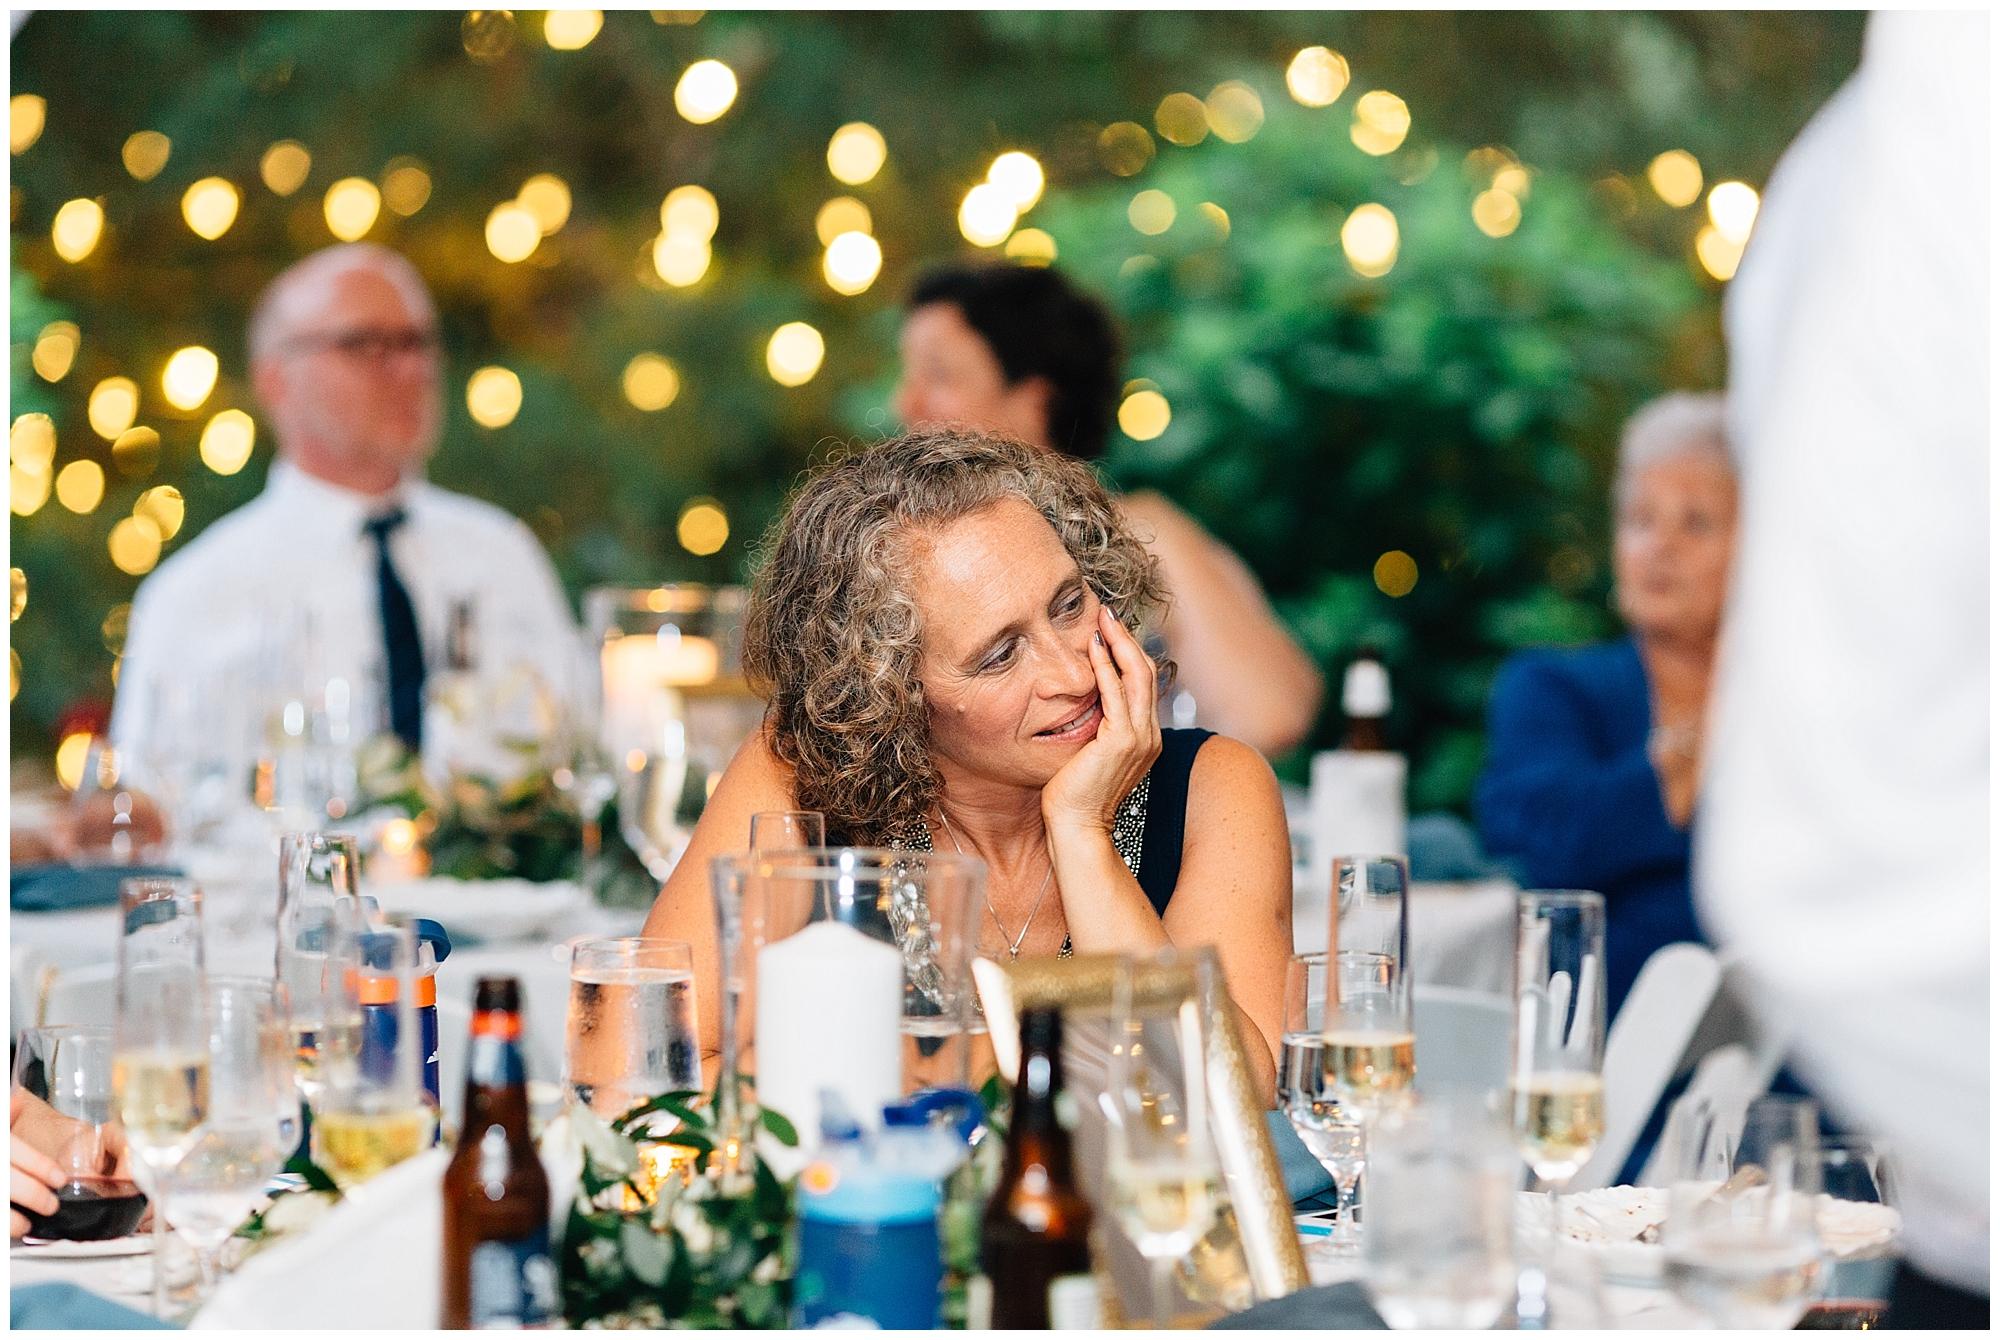 Oaks-at-salem-wedding-apex-photography-98.jpg